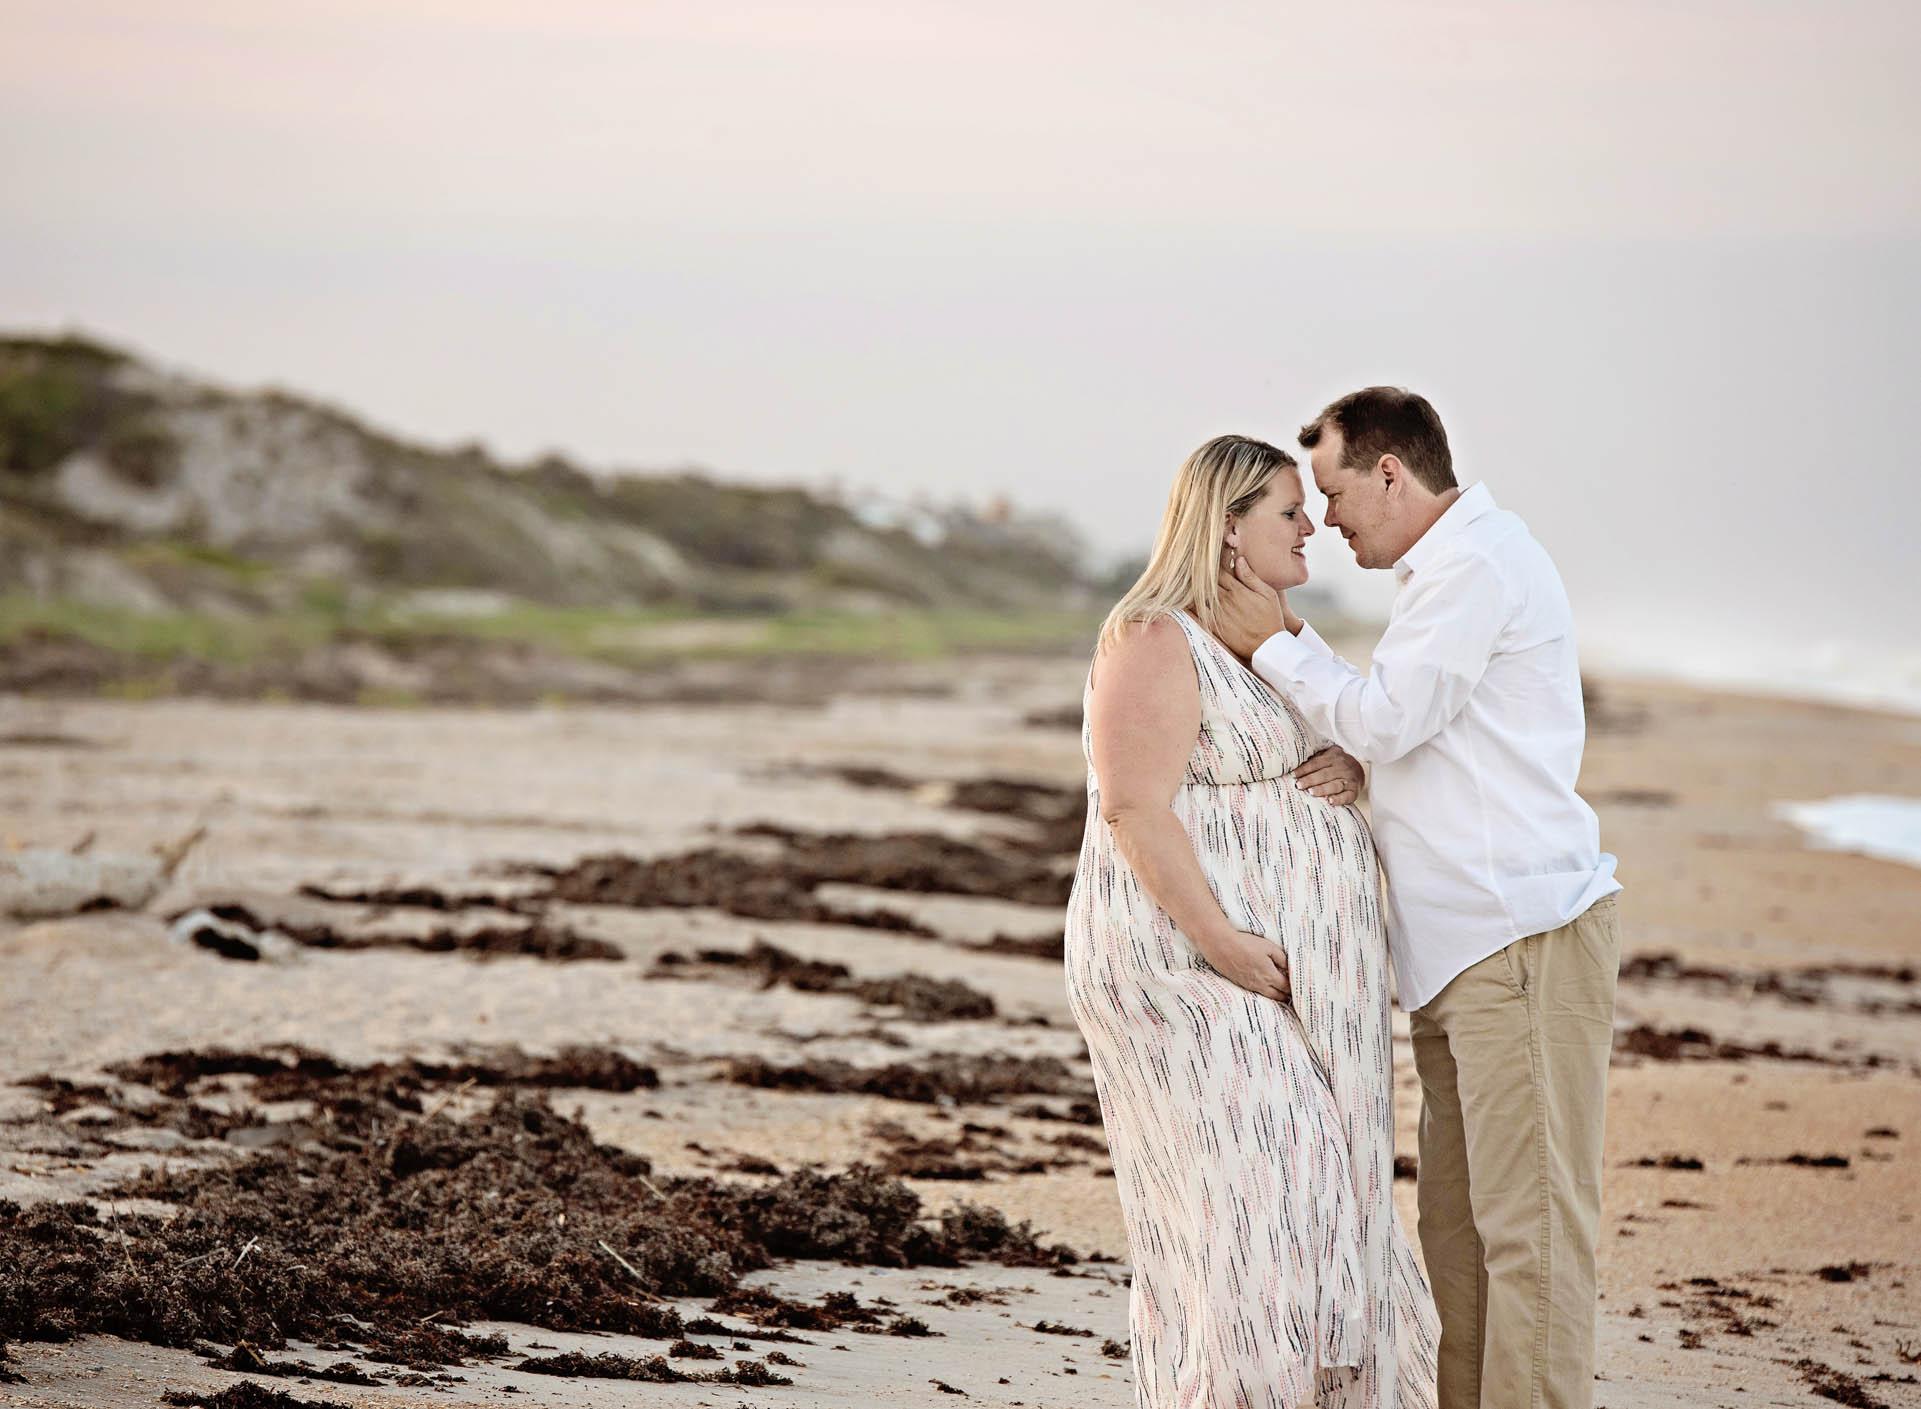 Titling/Alt Text/Description: 1. jacksonville newborn photography 2. ponte vedra beach 3. beach maternity 4. jacksonville maternity 5. st augustine newborn photography 6. beach